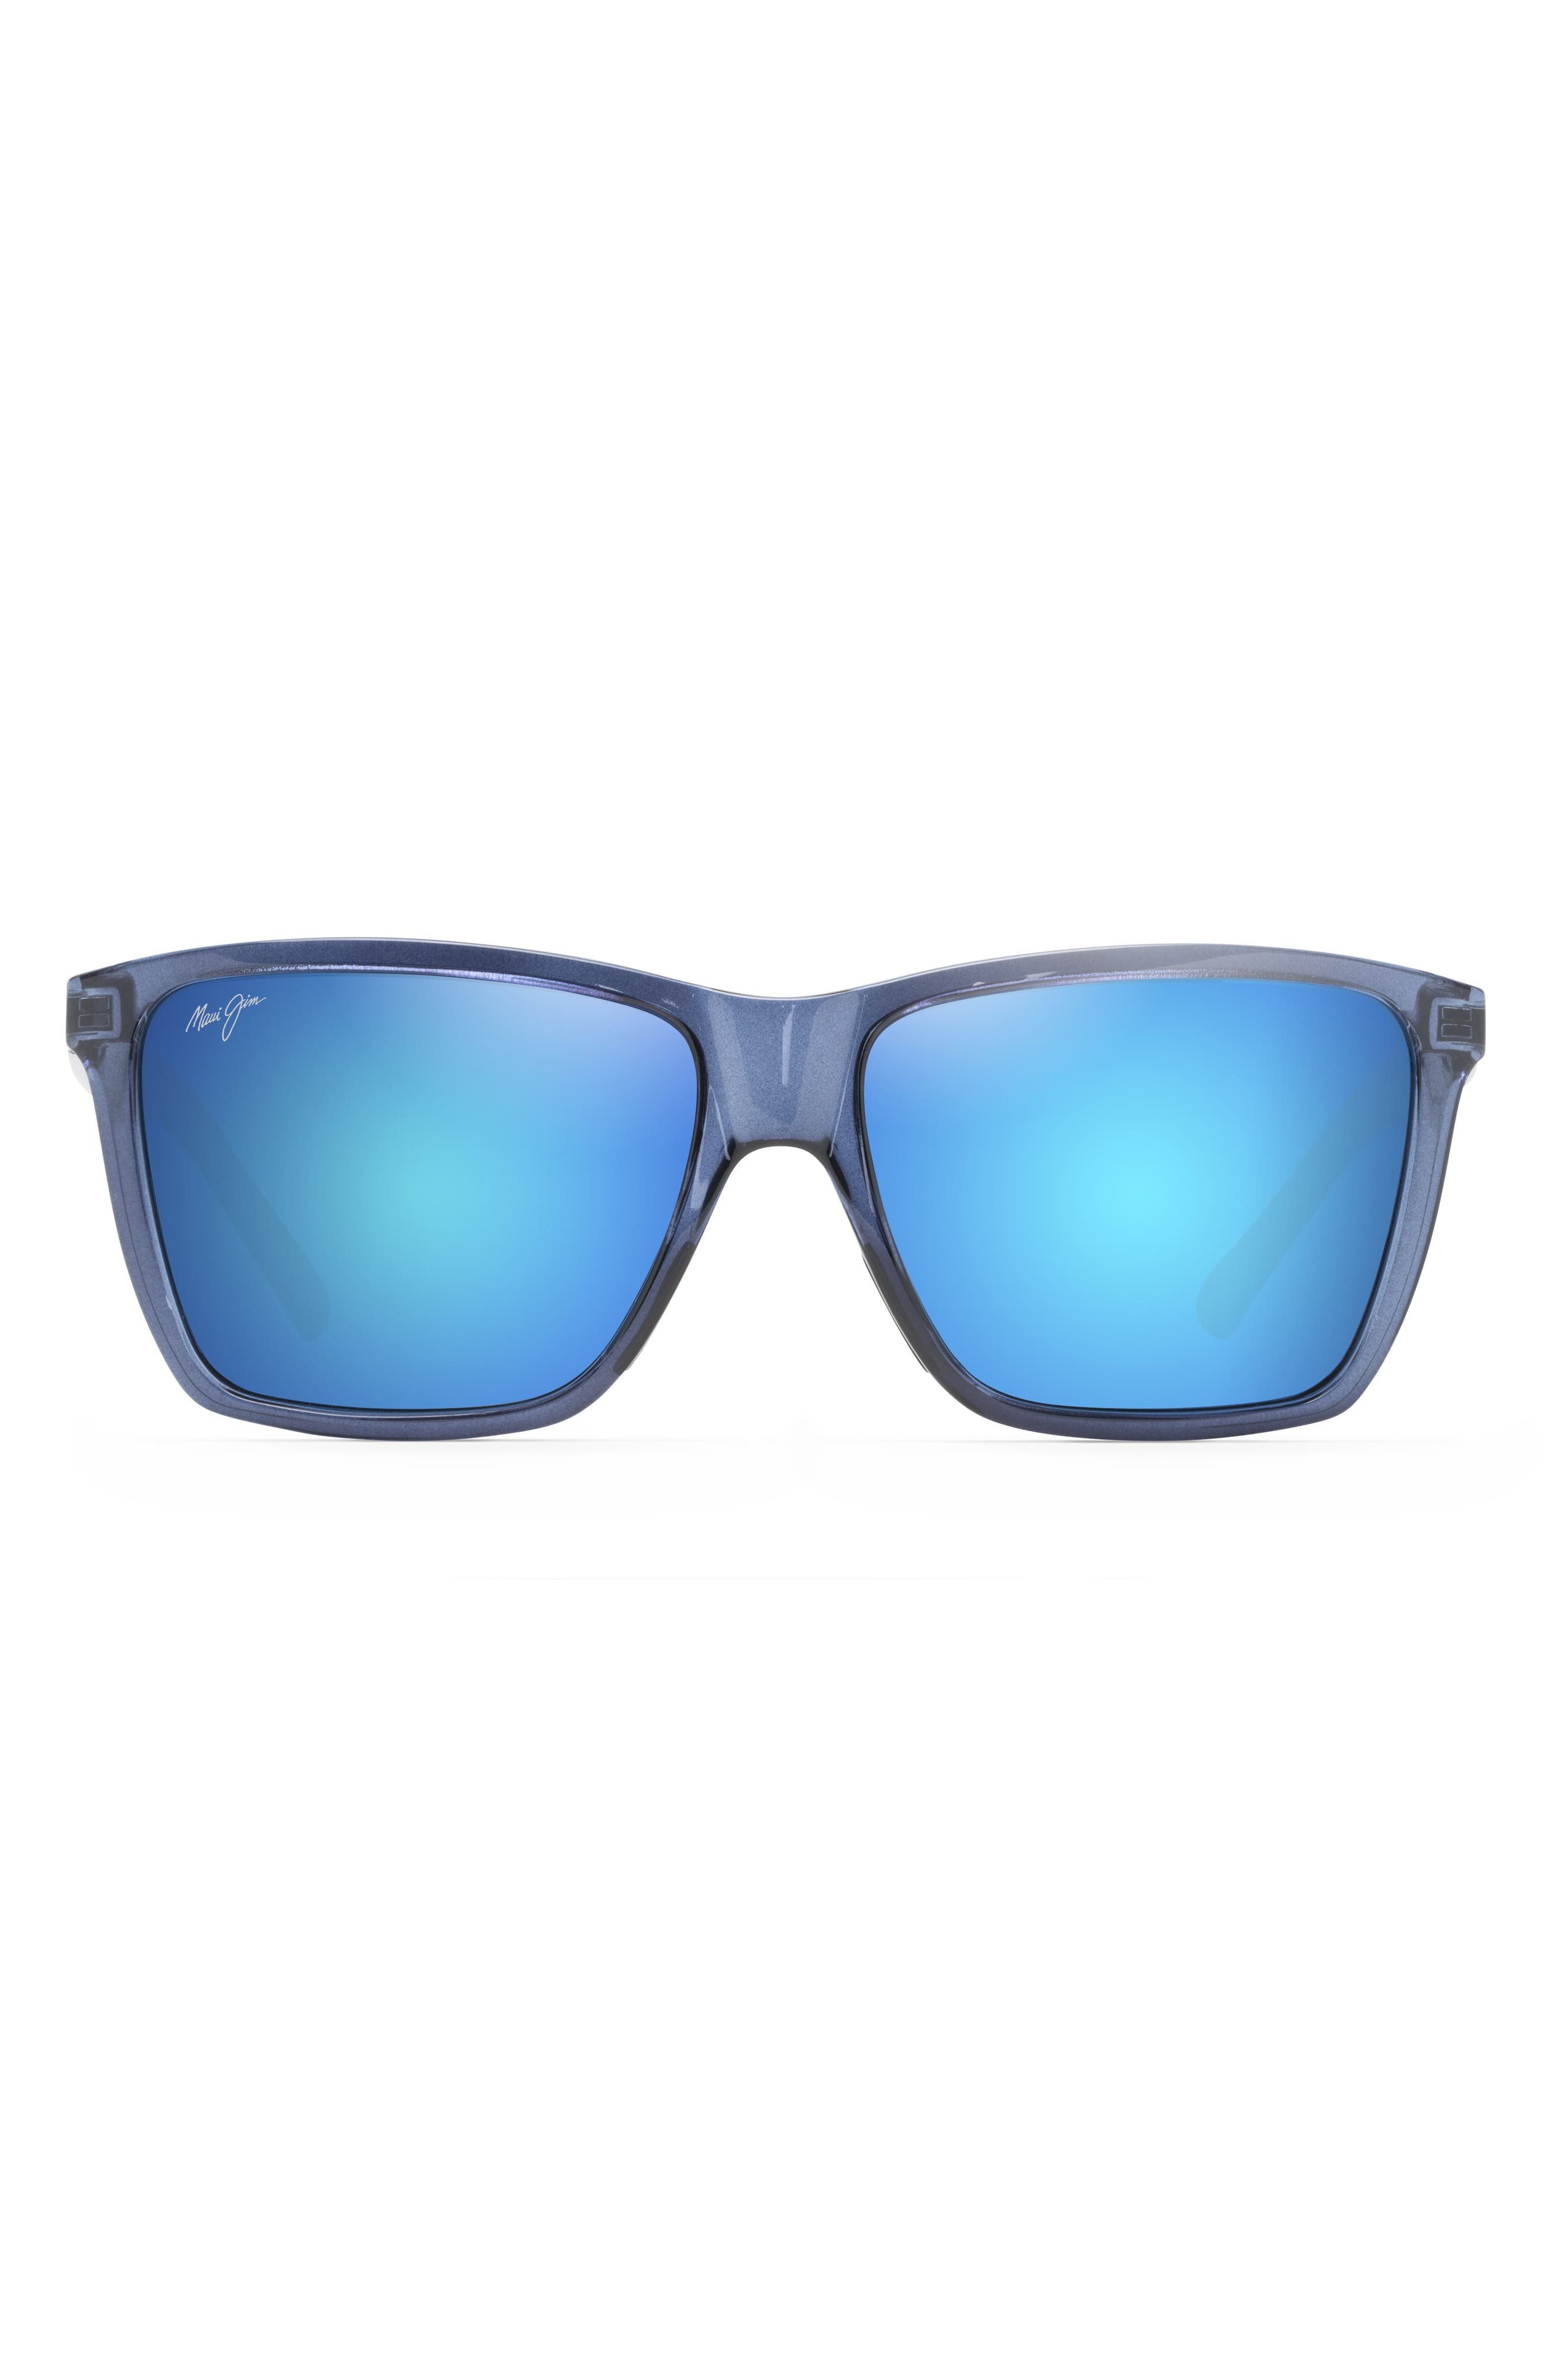 Cruzem 57mm Polarizedplus2 Rectangular Sunglasses